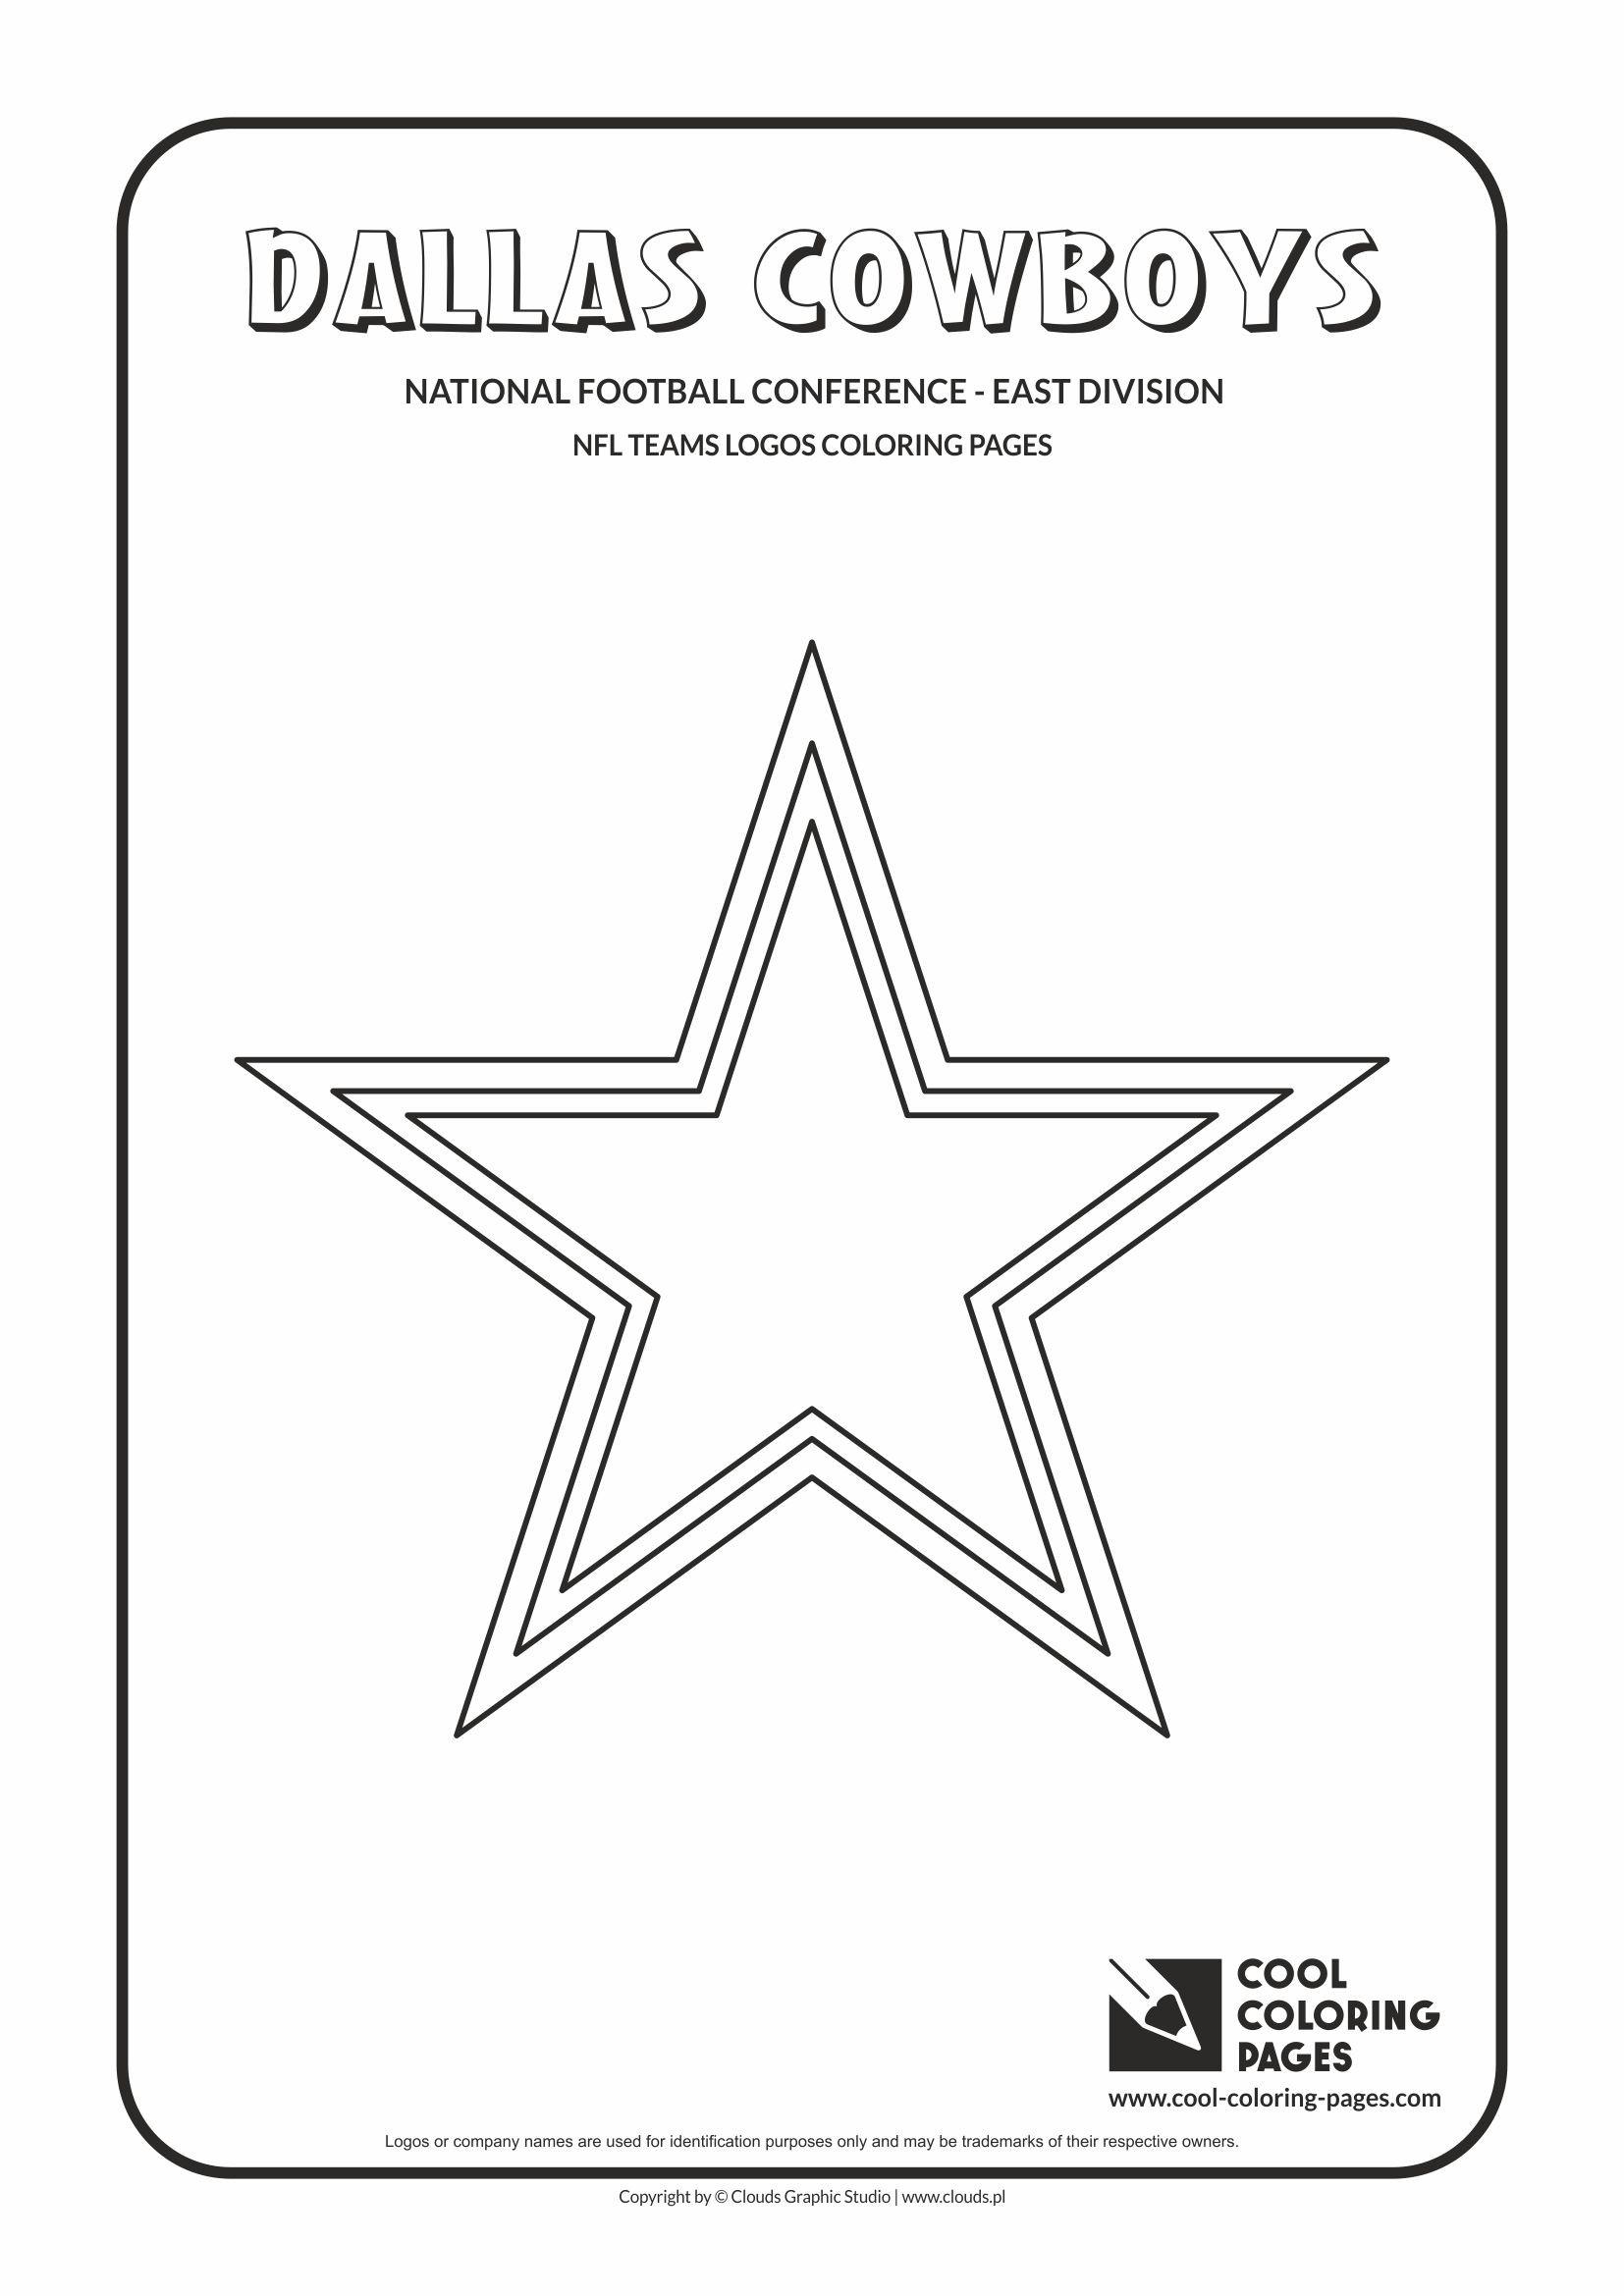 Dallas Cowboys Coloring Pages  Cool Coloring Pages NFL teams logos coloring pages Cool